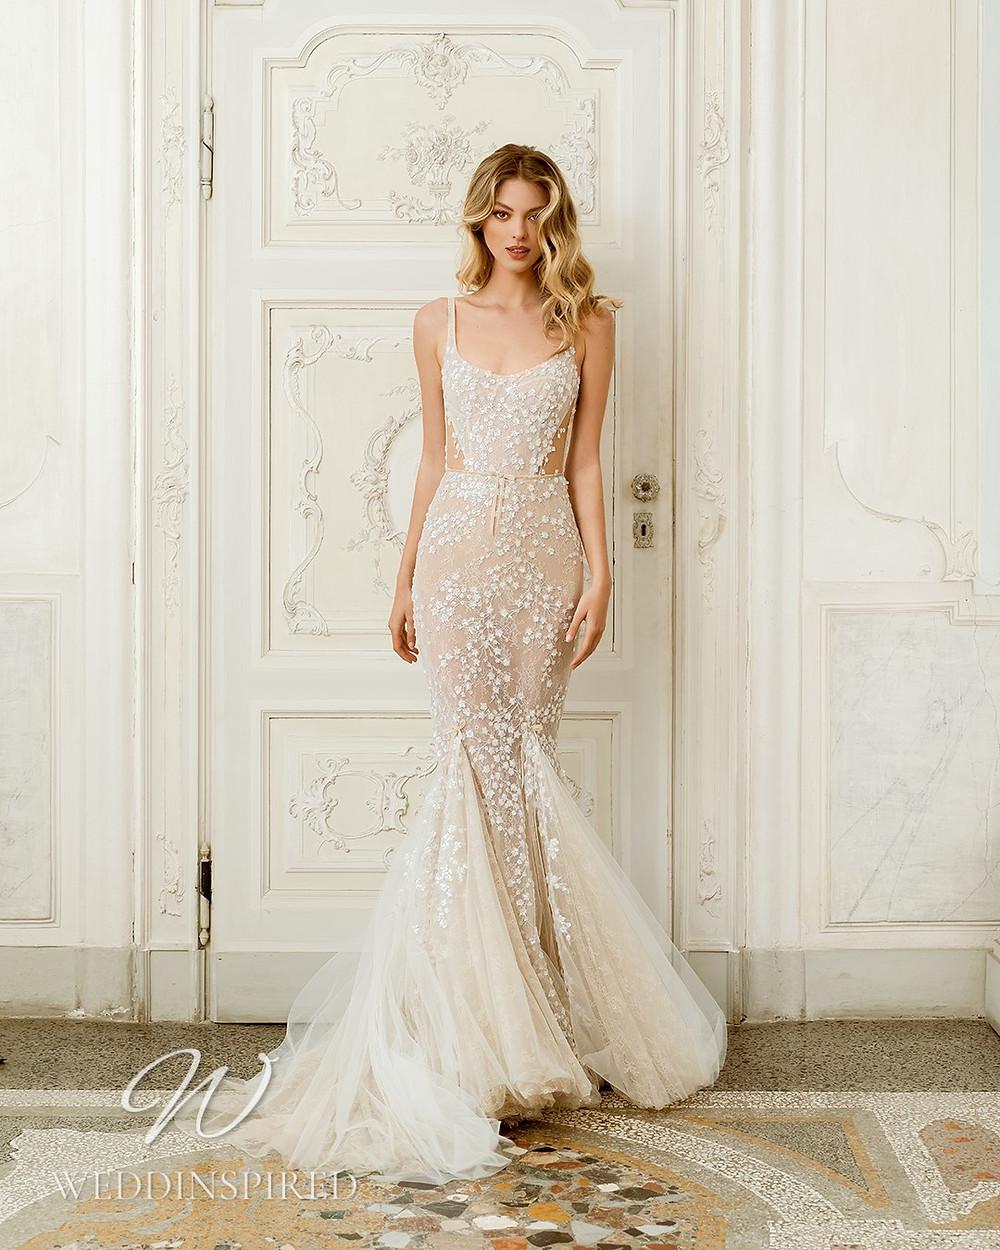 A Berta 2022 blush lace mermaid wedding dress